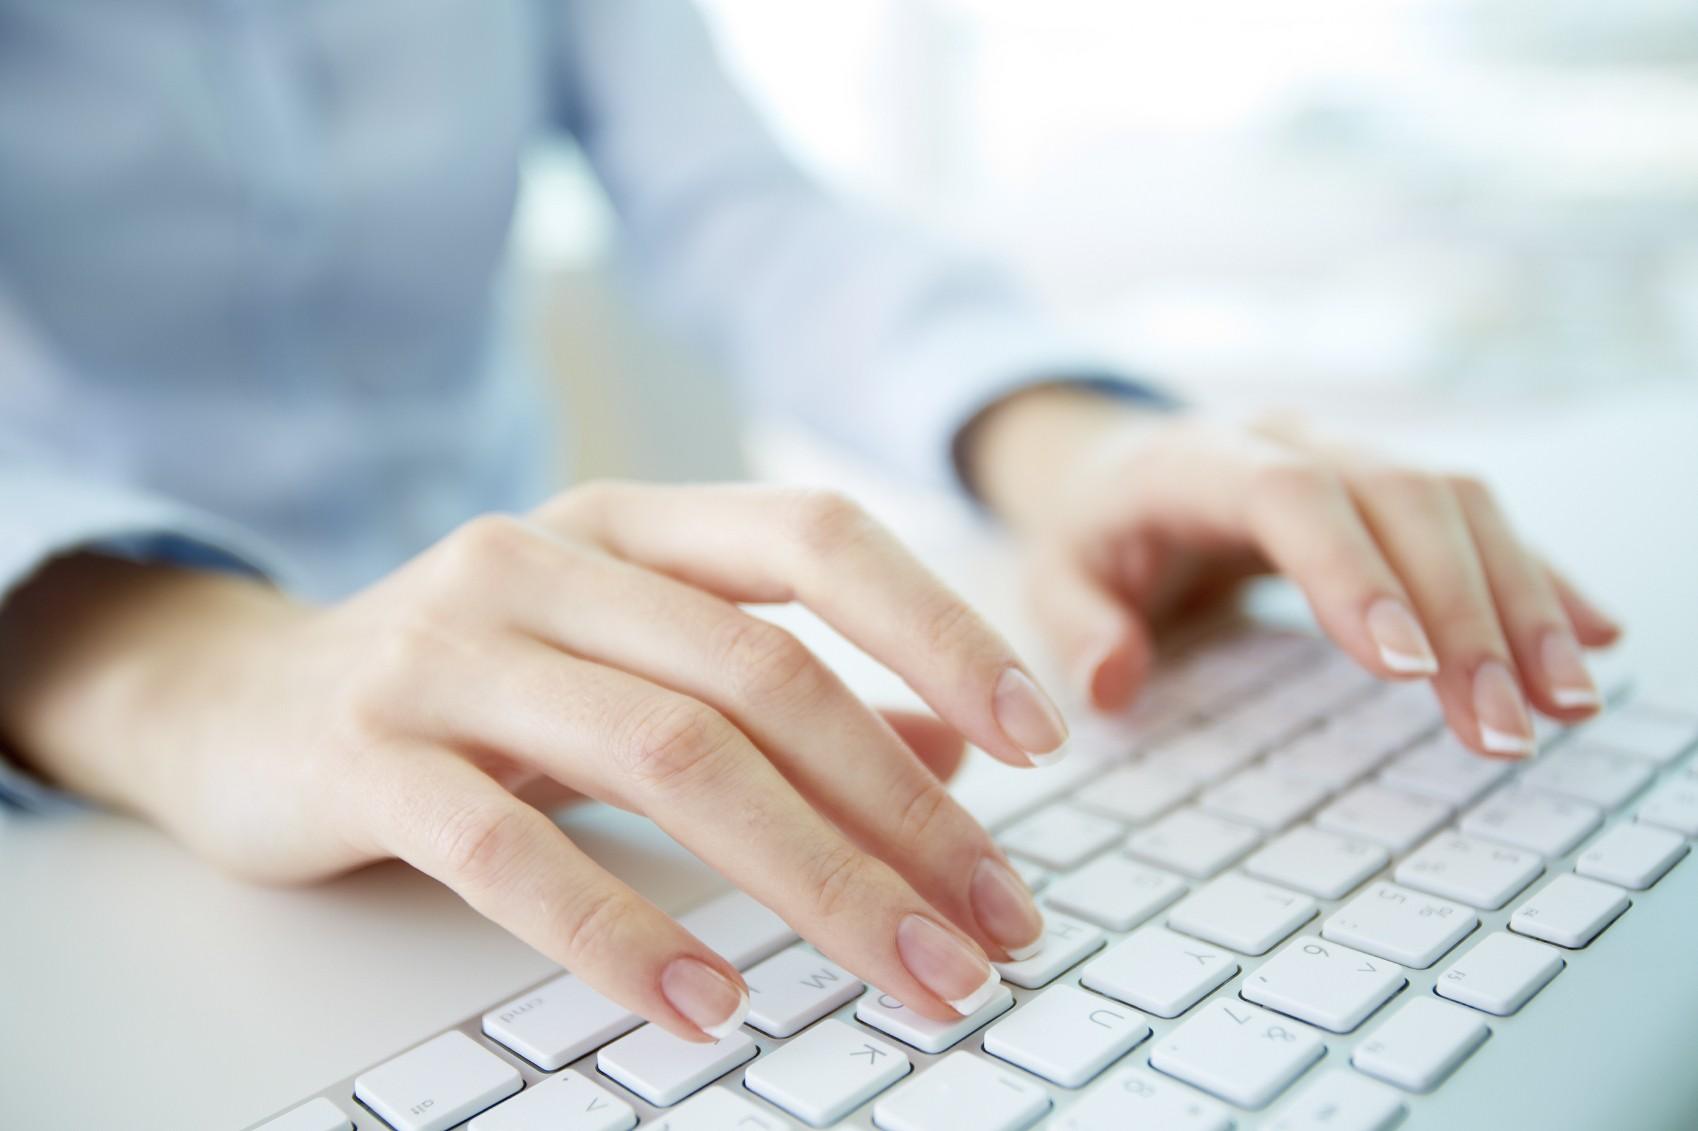 Author jobs in custom essay writing